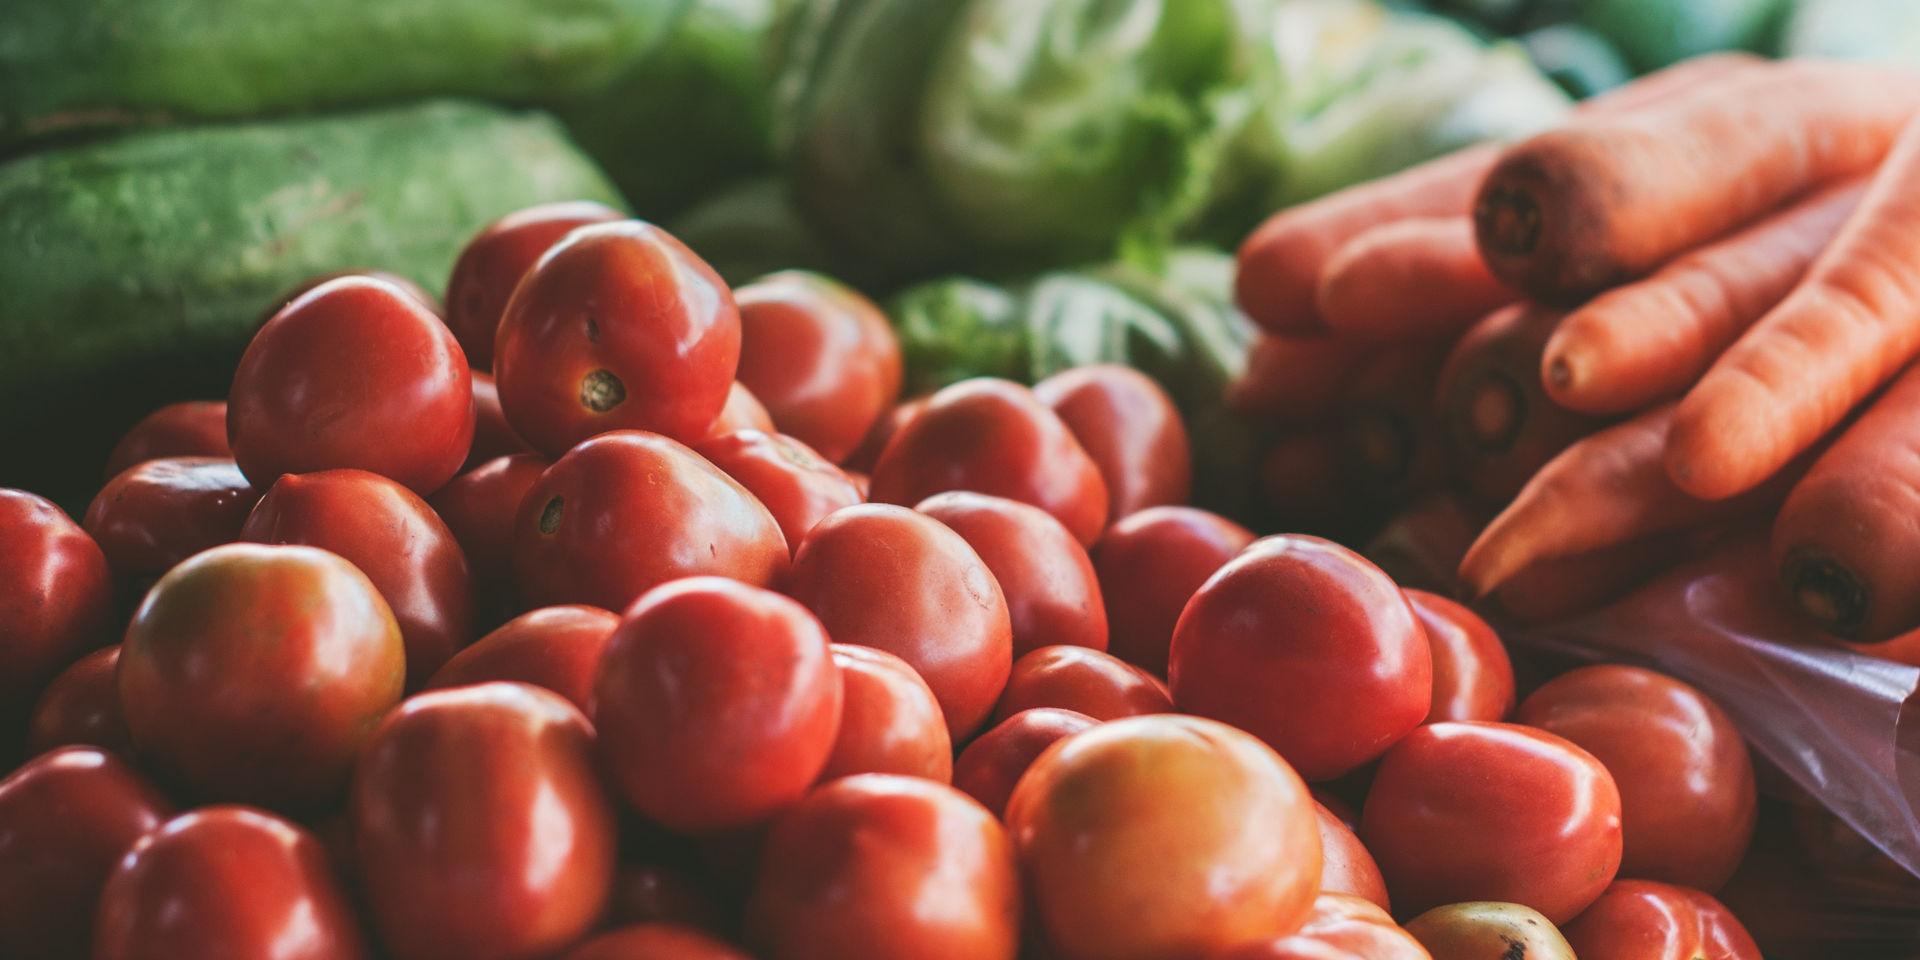 A pile of fresh vegetables. Photo by Sven Scheuermeier on Unsplash.